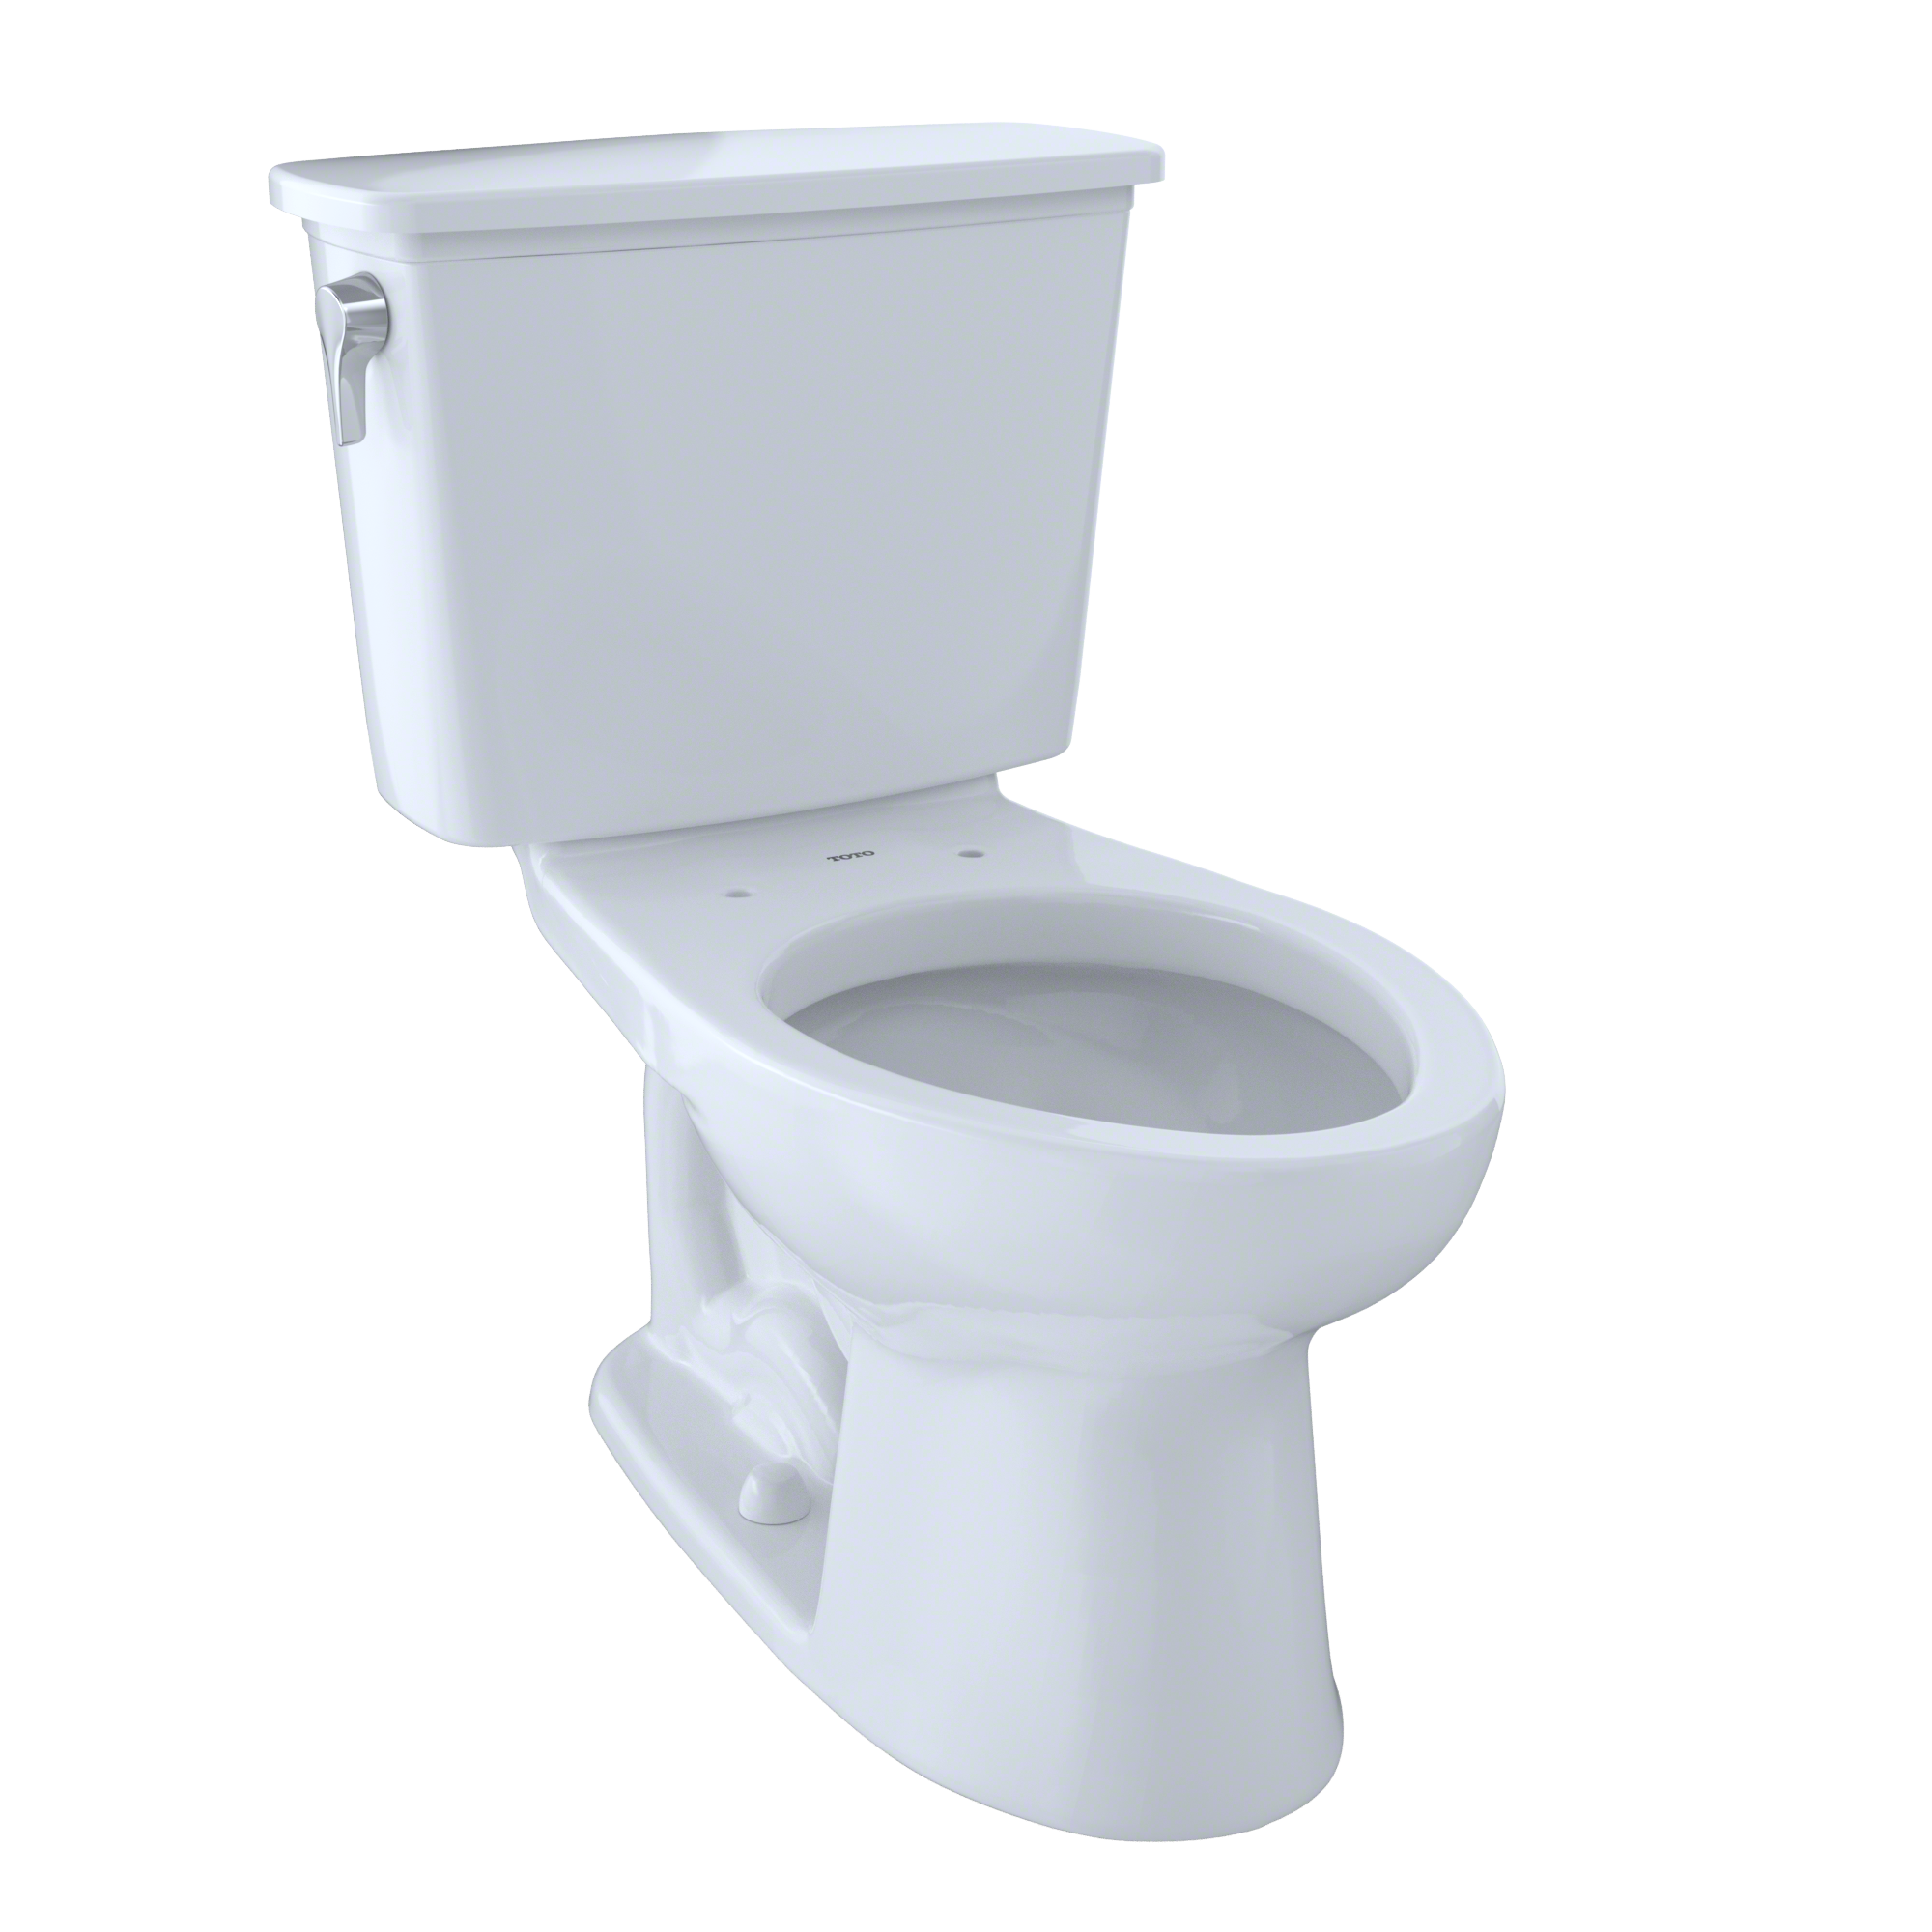 TOTO® Eco Drake® Transitional Two-Piece Elongated 1.28 GPF Toilet, Cotton White - CST744EN#01